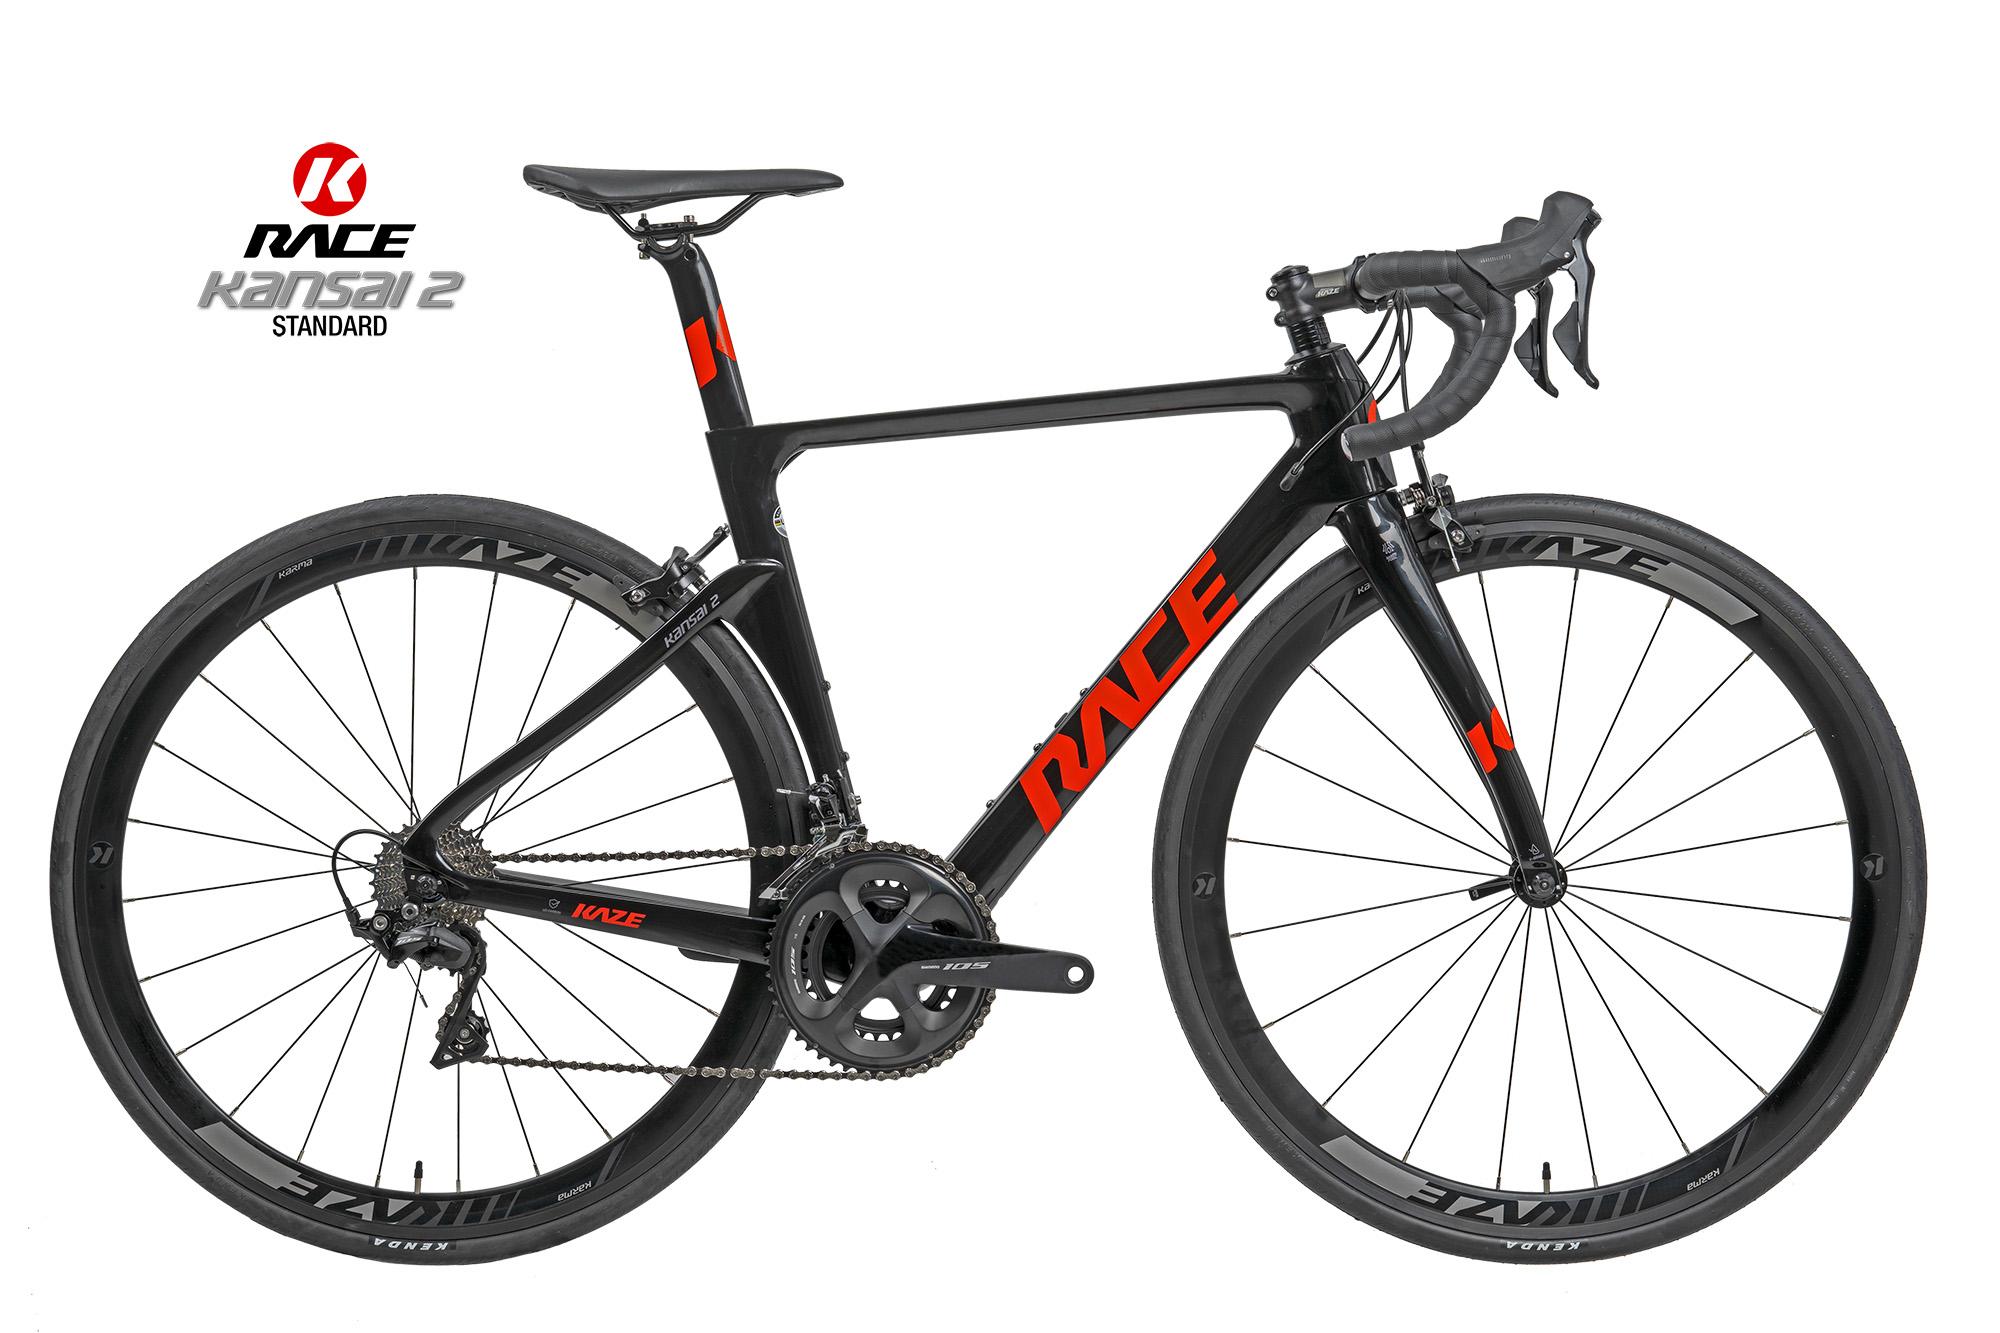 KAZE RACE | Kansai 2 (Standard) Shimano 105 Alu Wheel